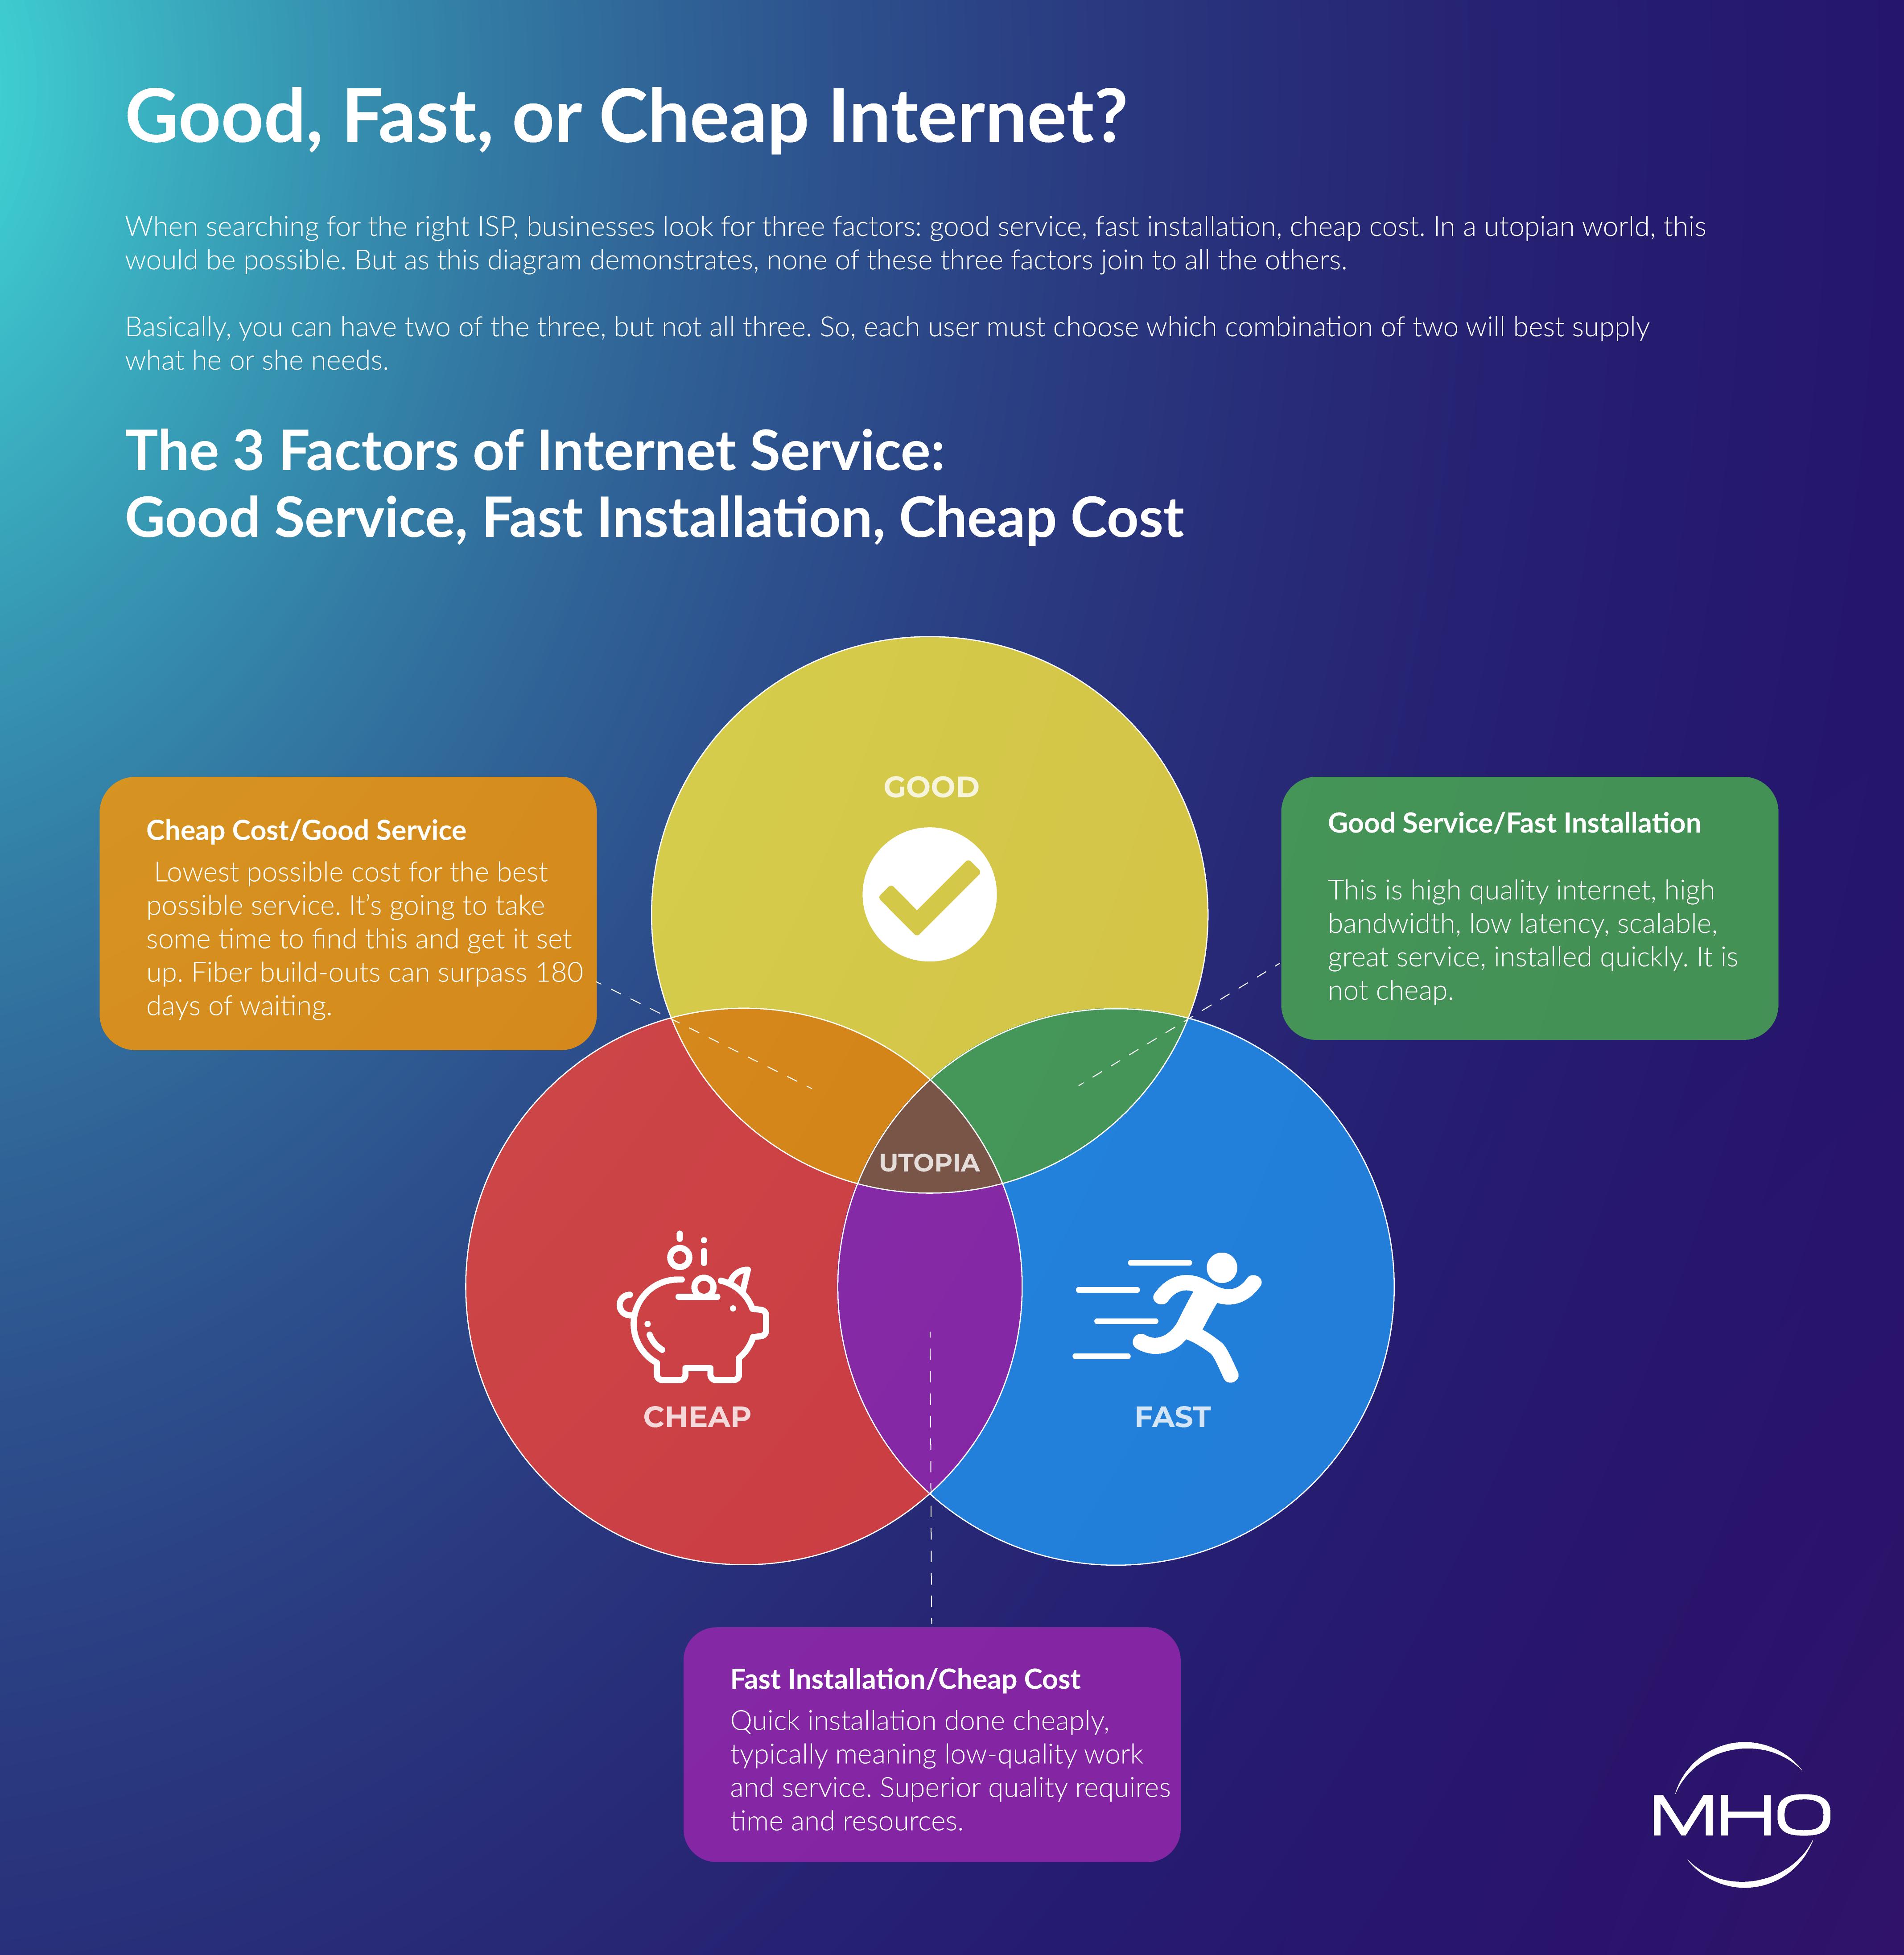 Good, Fast, or Cheap Internet?